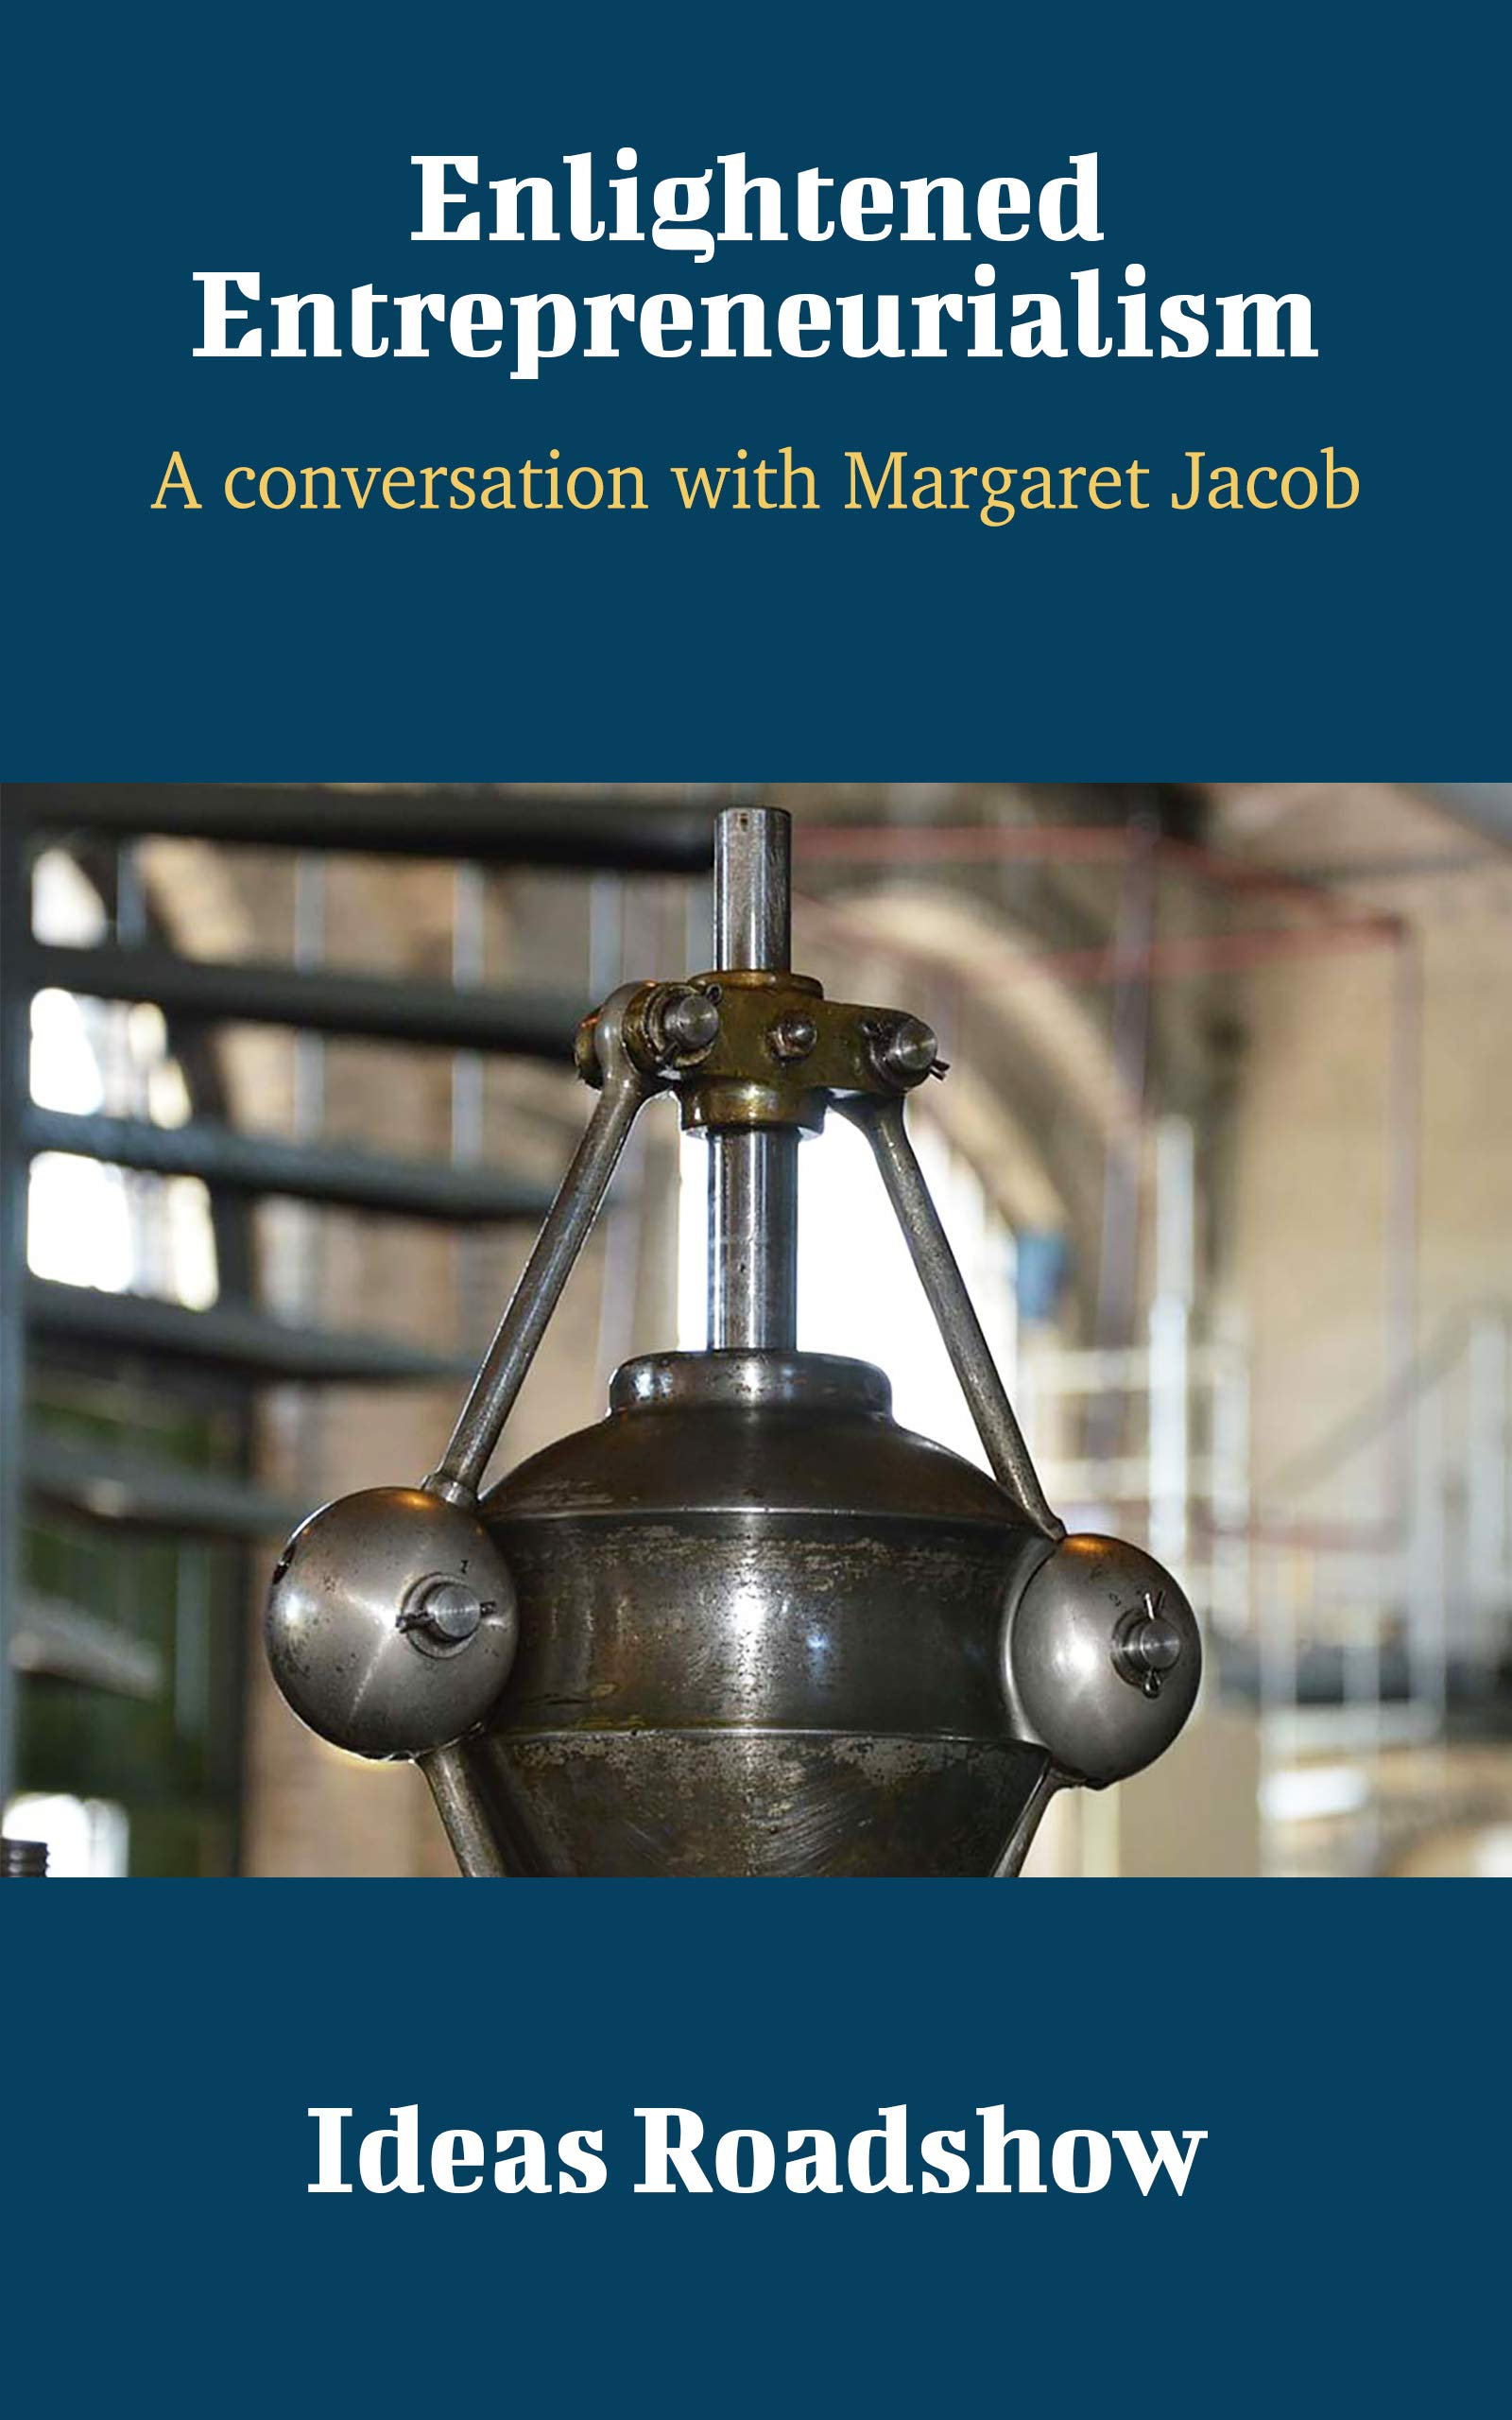 Enlightened Entrepreneurialism: A Conversation with Margaret Jacob (Ideas Roadshow Conversations)